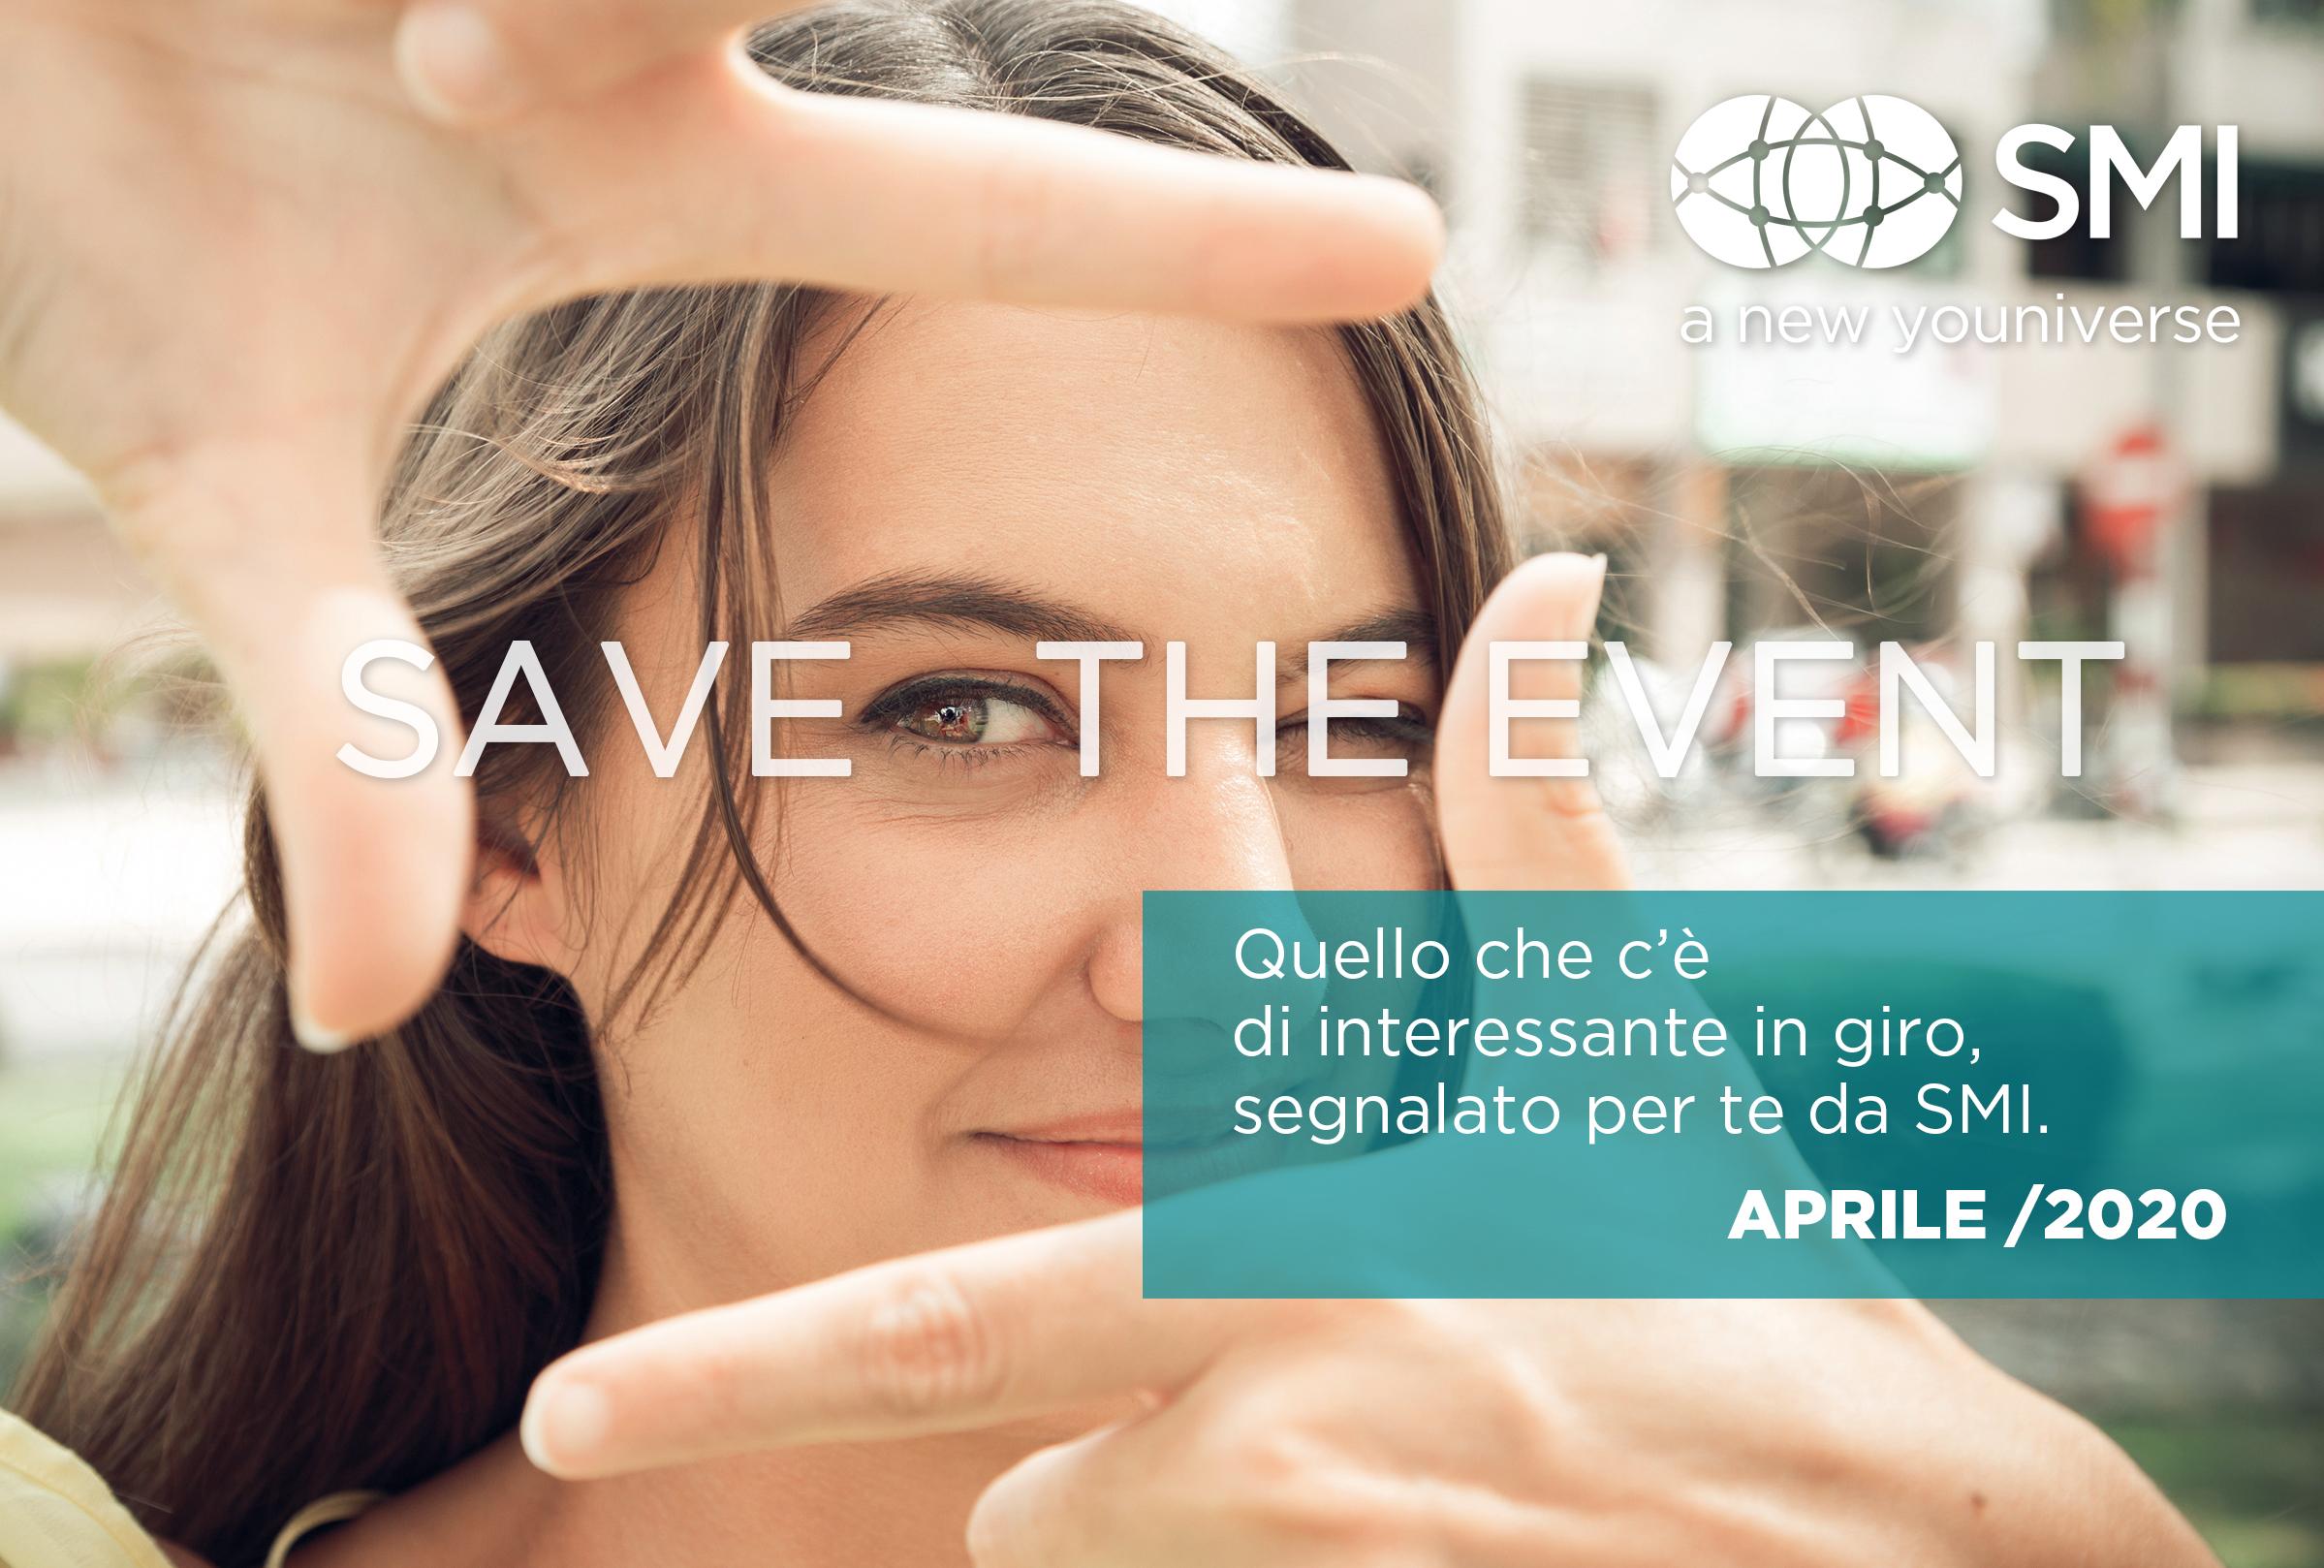 #savethevent_aprile 2020